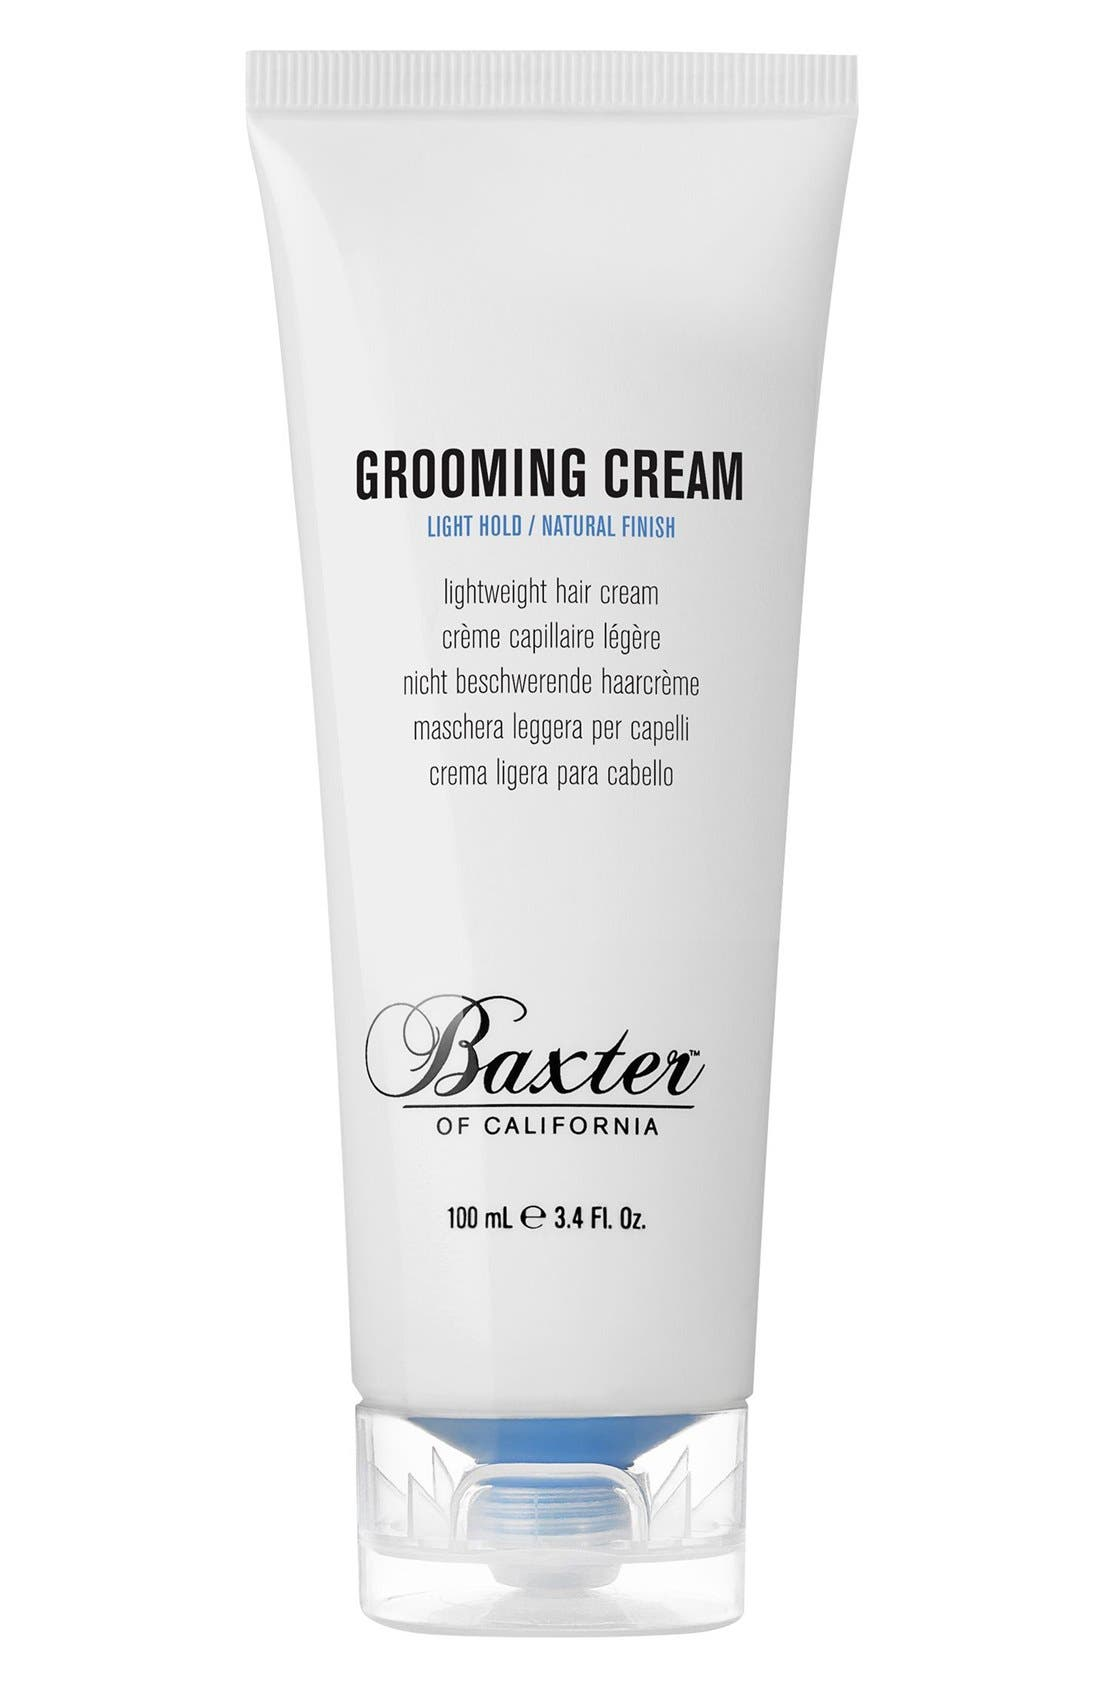 Grooming Cream,                             Main thumbnail 1, color,                             NO COLOR